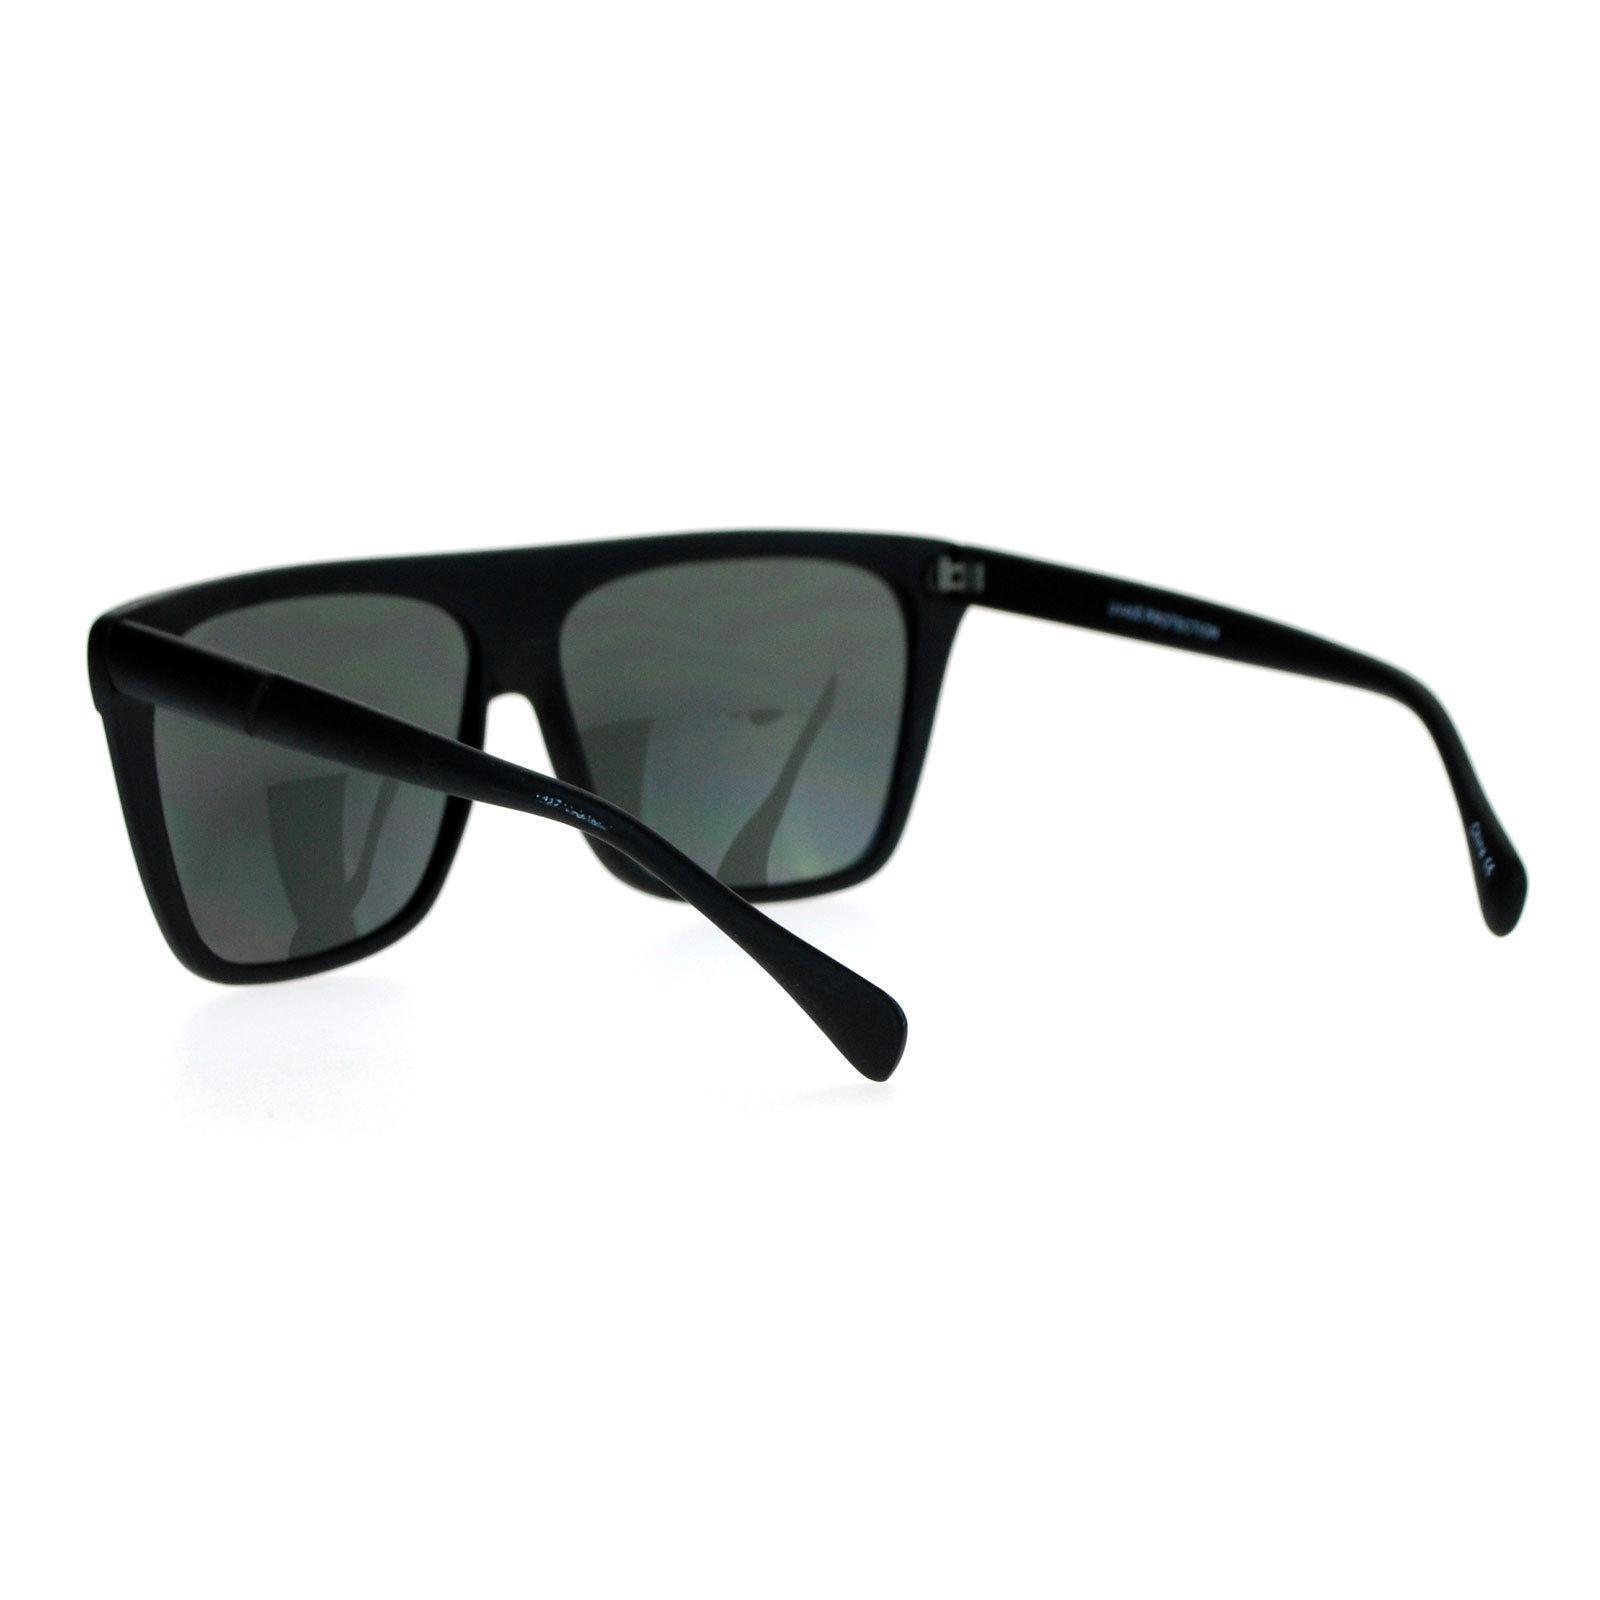 Unisex Fashion Sunglasses Classic Square Flat Matted Top Frame UV 400